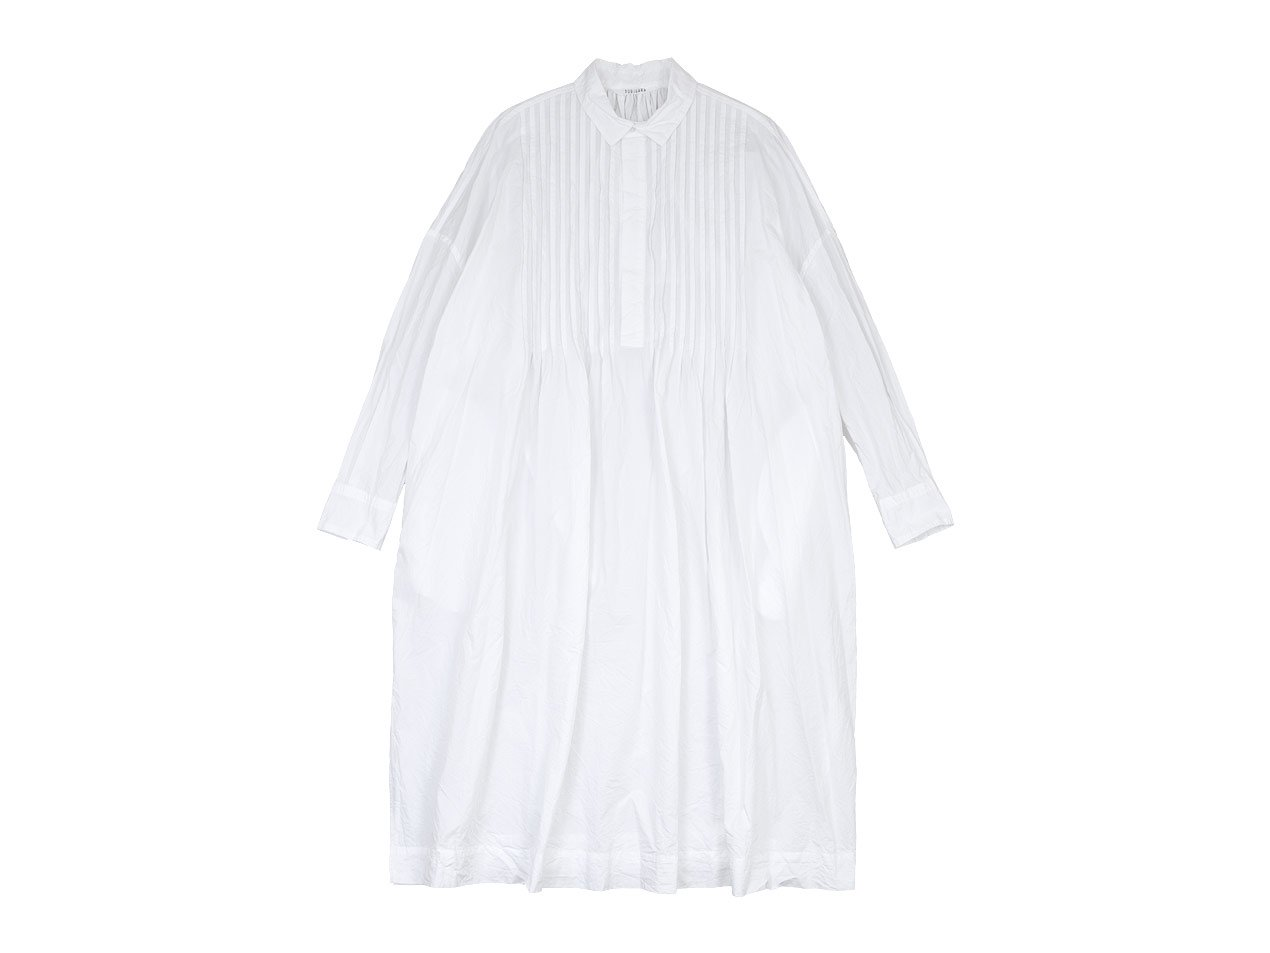 TOUJOURS Back Gathered Pin Tuck Shirt Dress WHITE【MM31FD04】